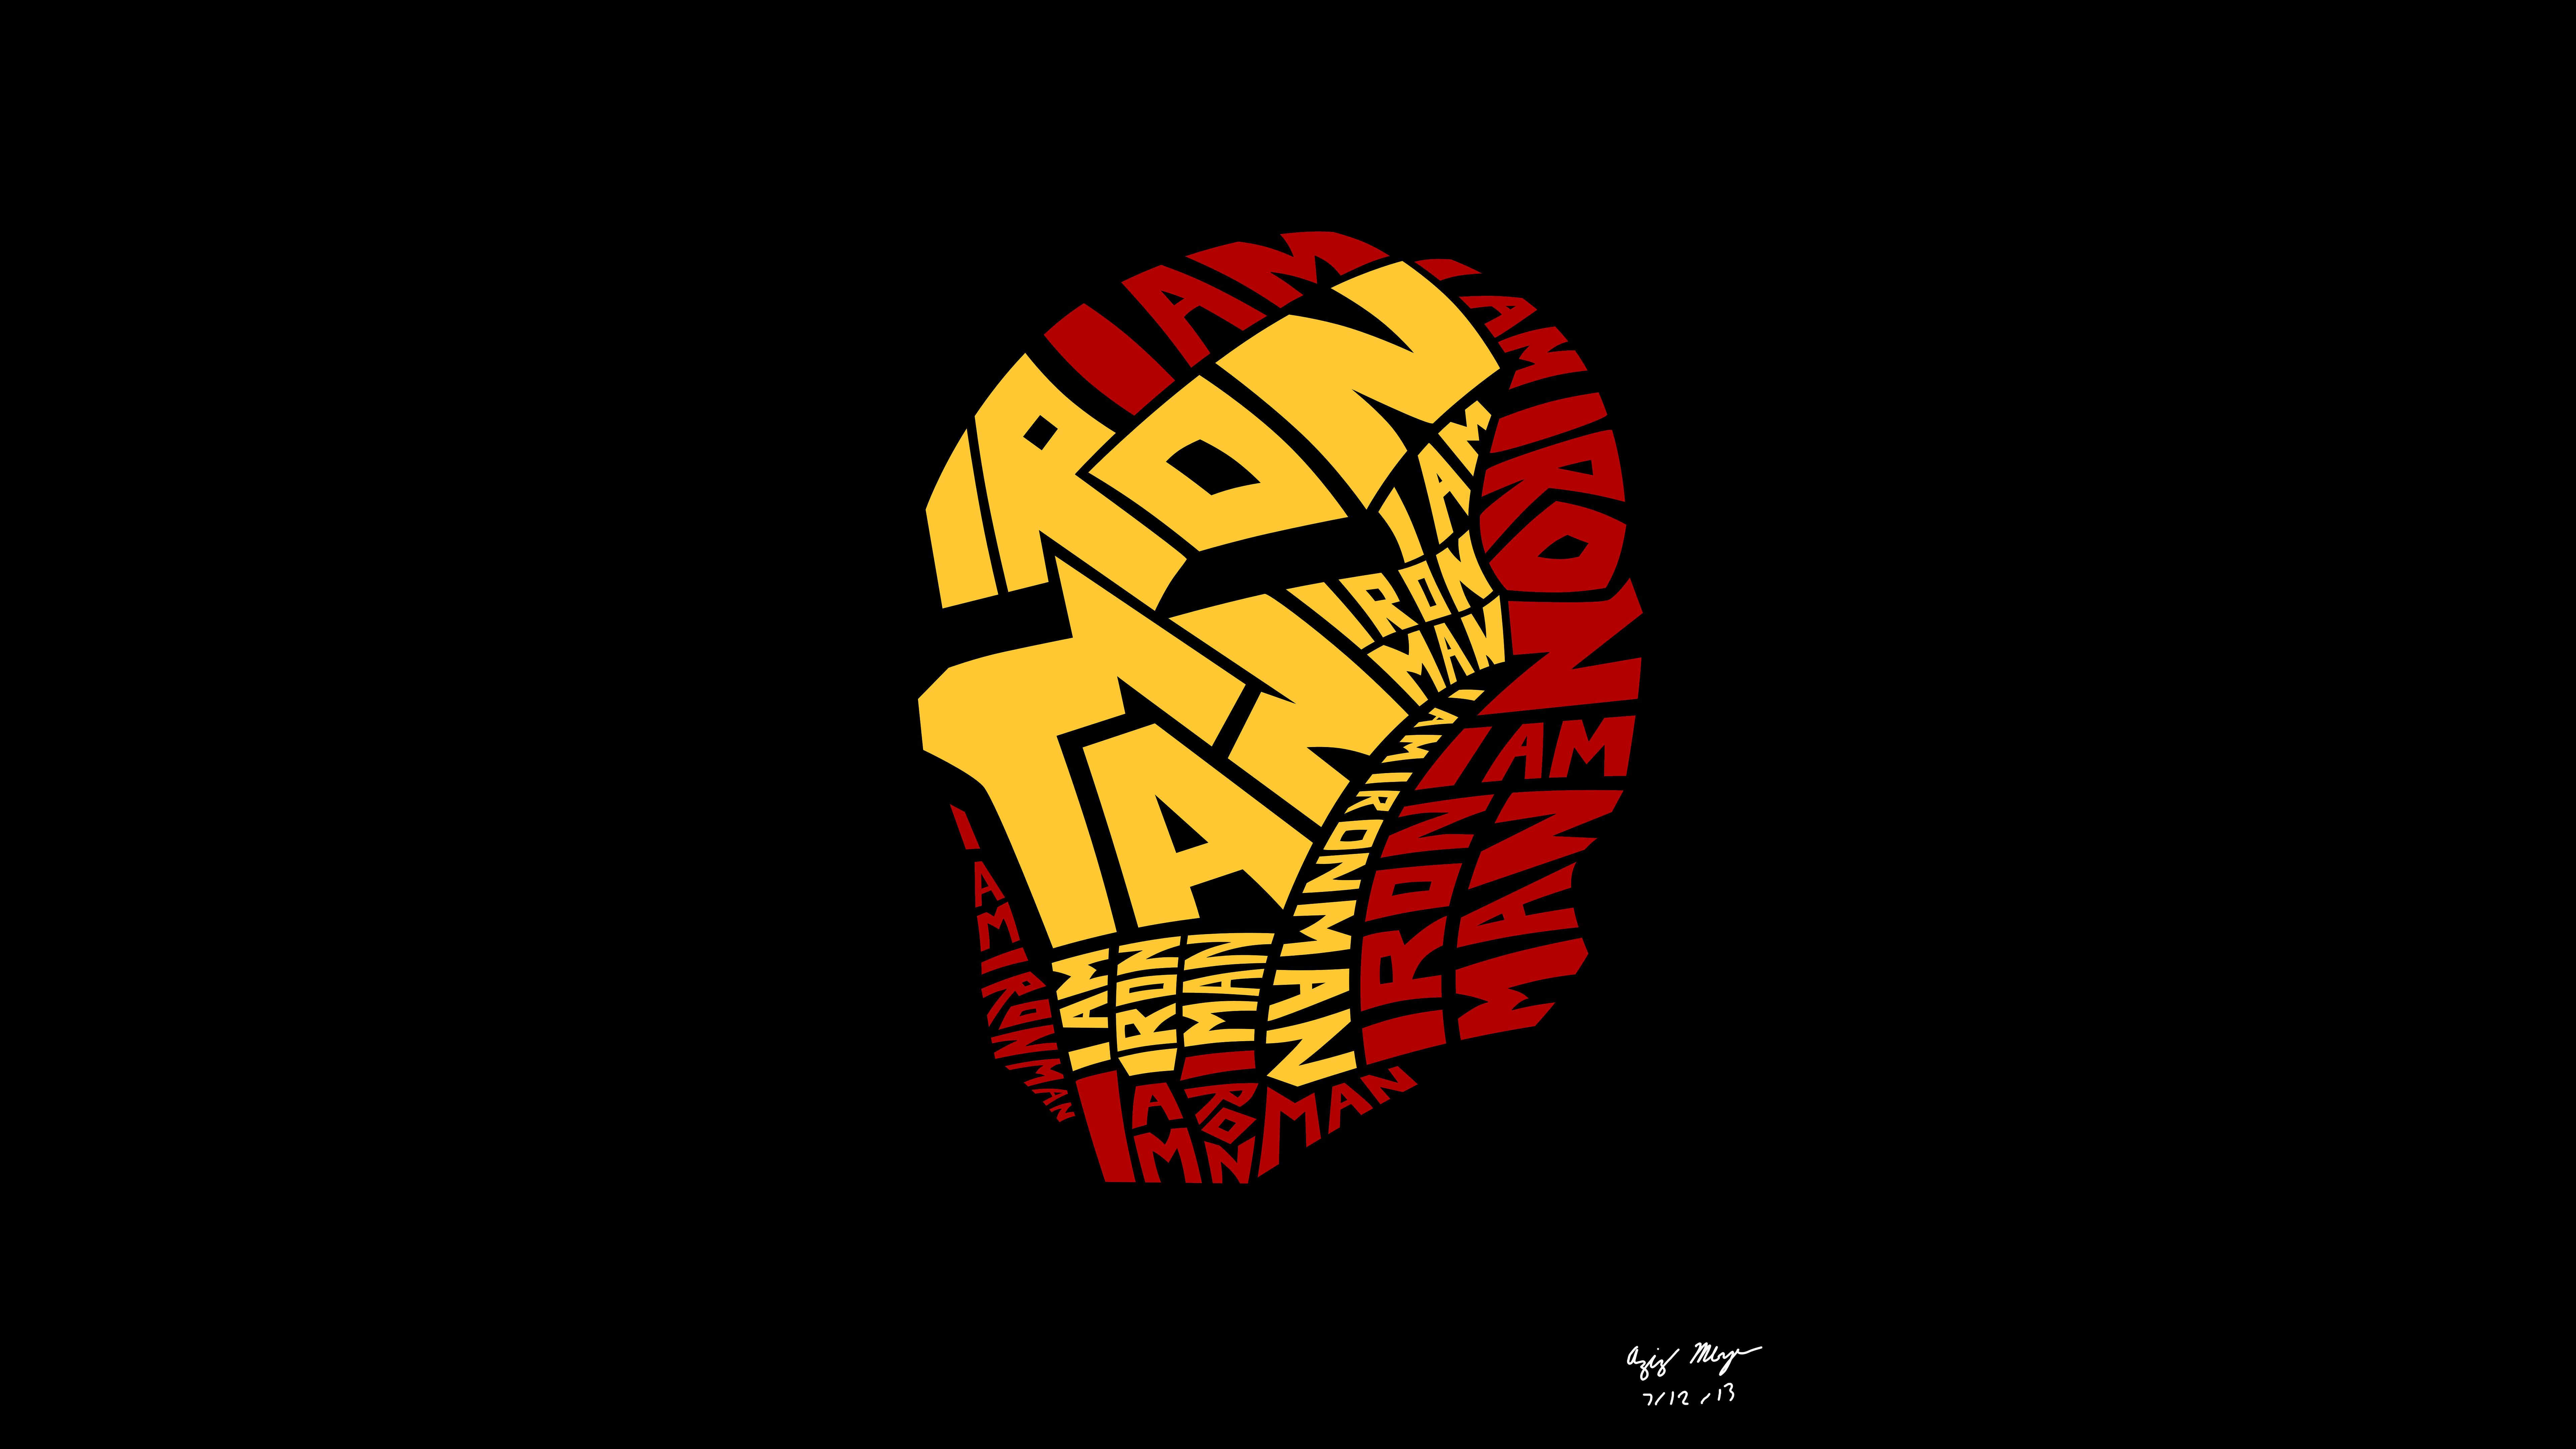 iron-man-typography-artwork-8k-qj.jpg